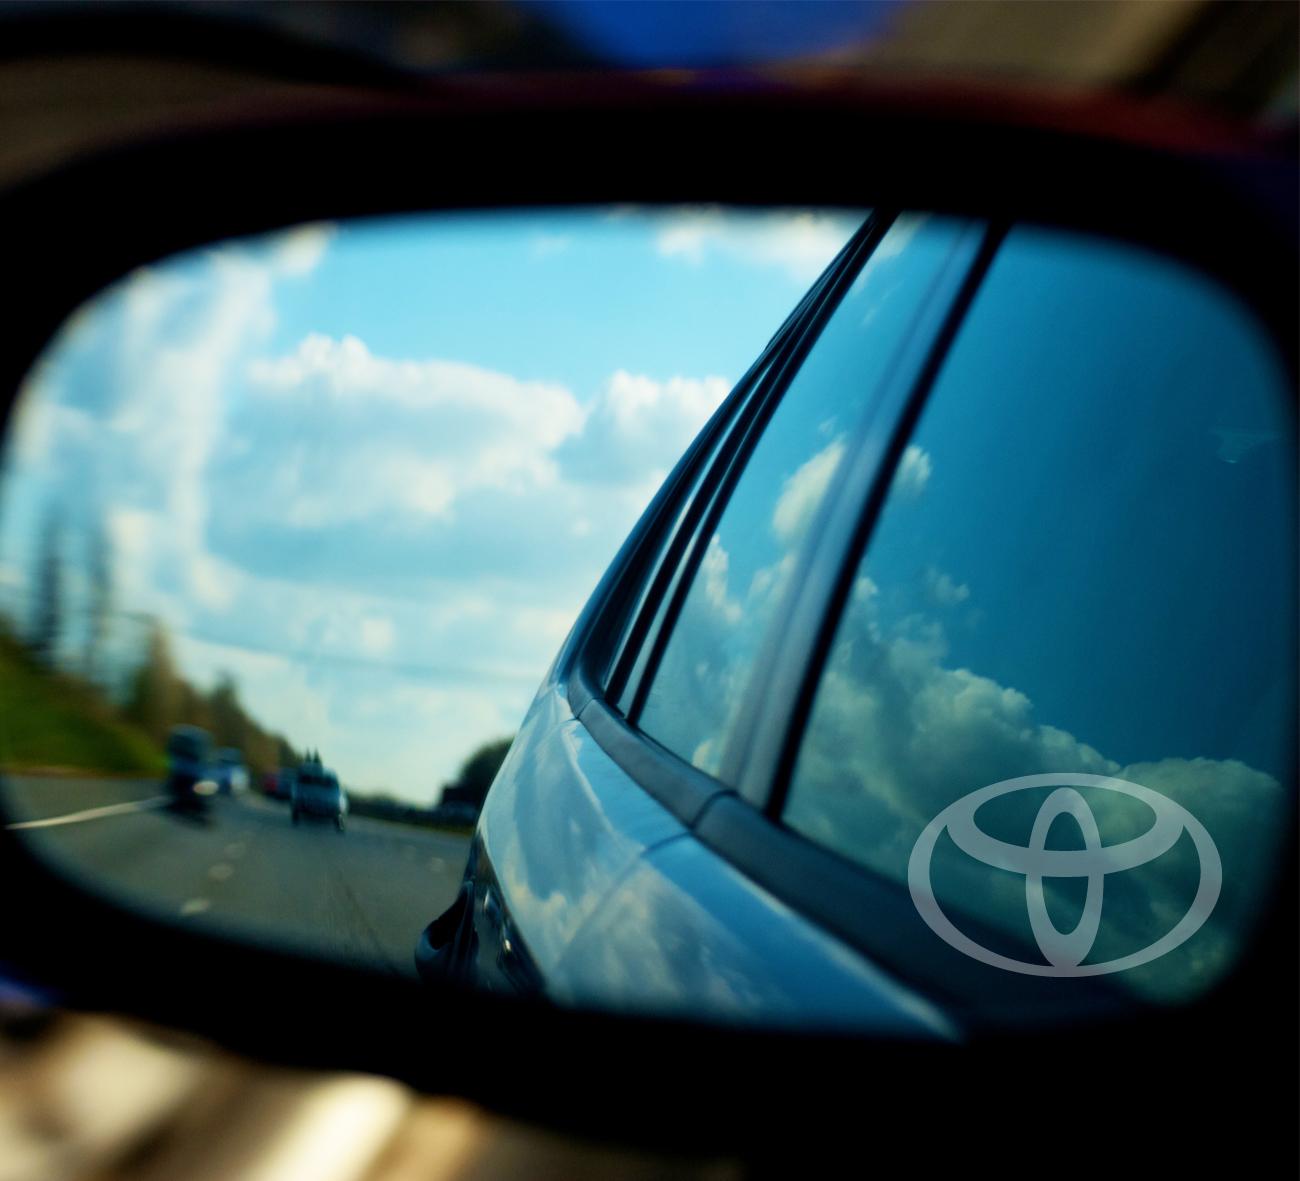 TOYOTA WING MIRROR ETCHED GLASS CAR VINYL DECALS-STICKERS x3-7 YR VINYL-BODY MOD